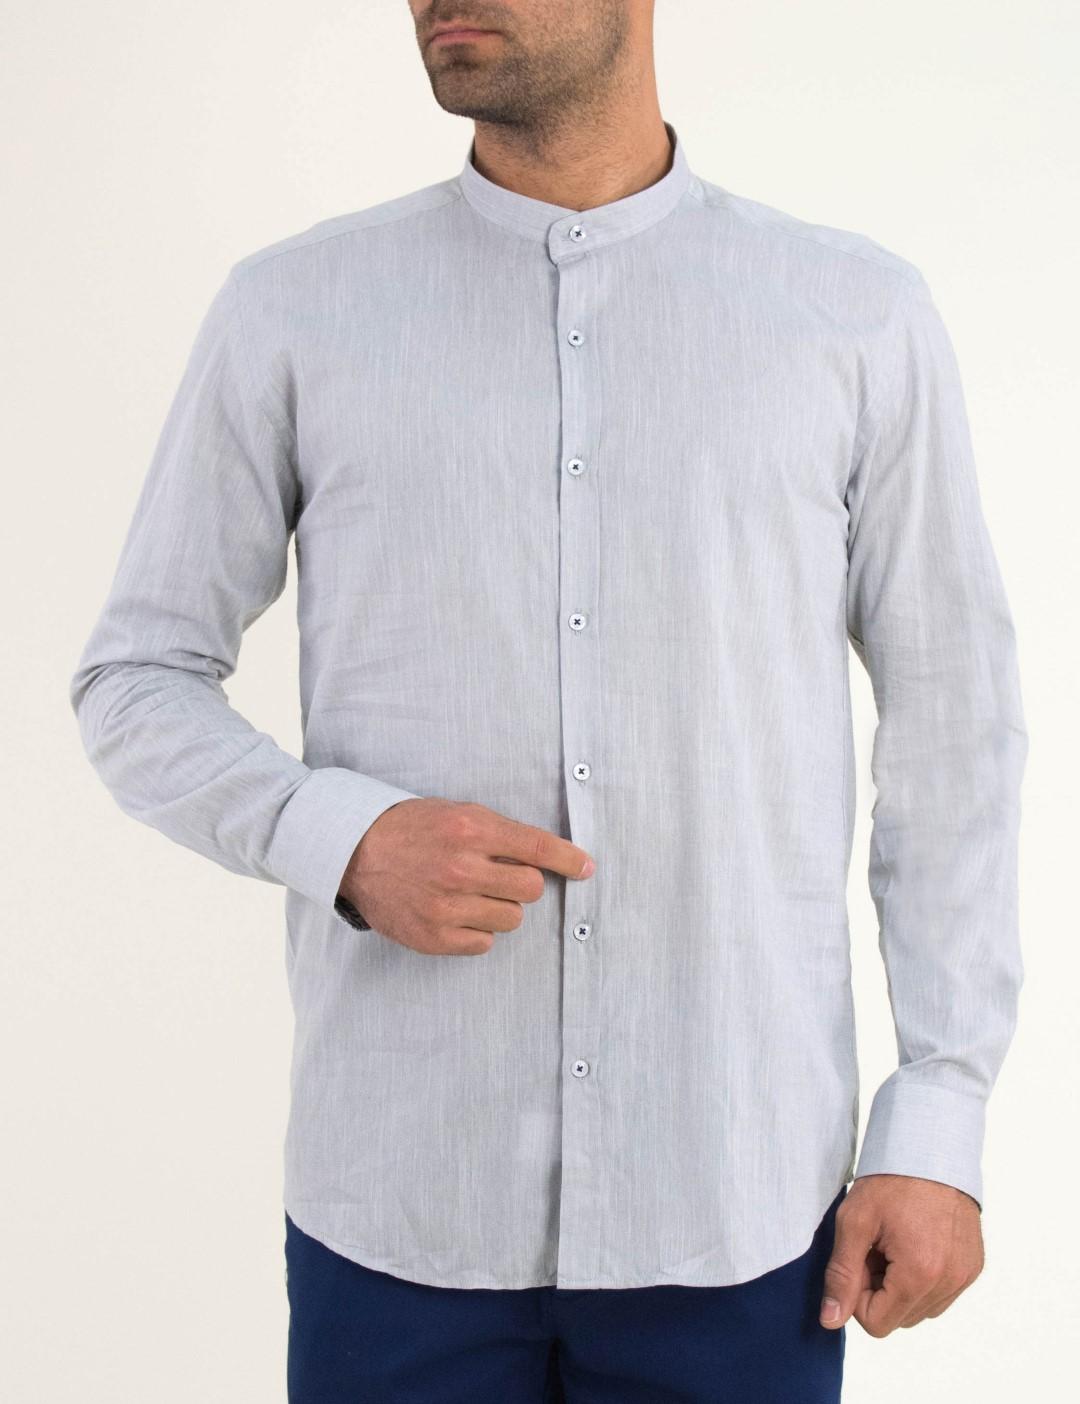 87f5e5803078 Ανδρικό γκρι πουκάμισο μαο γιακά Firenze 0195110F